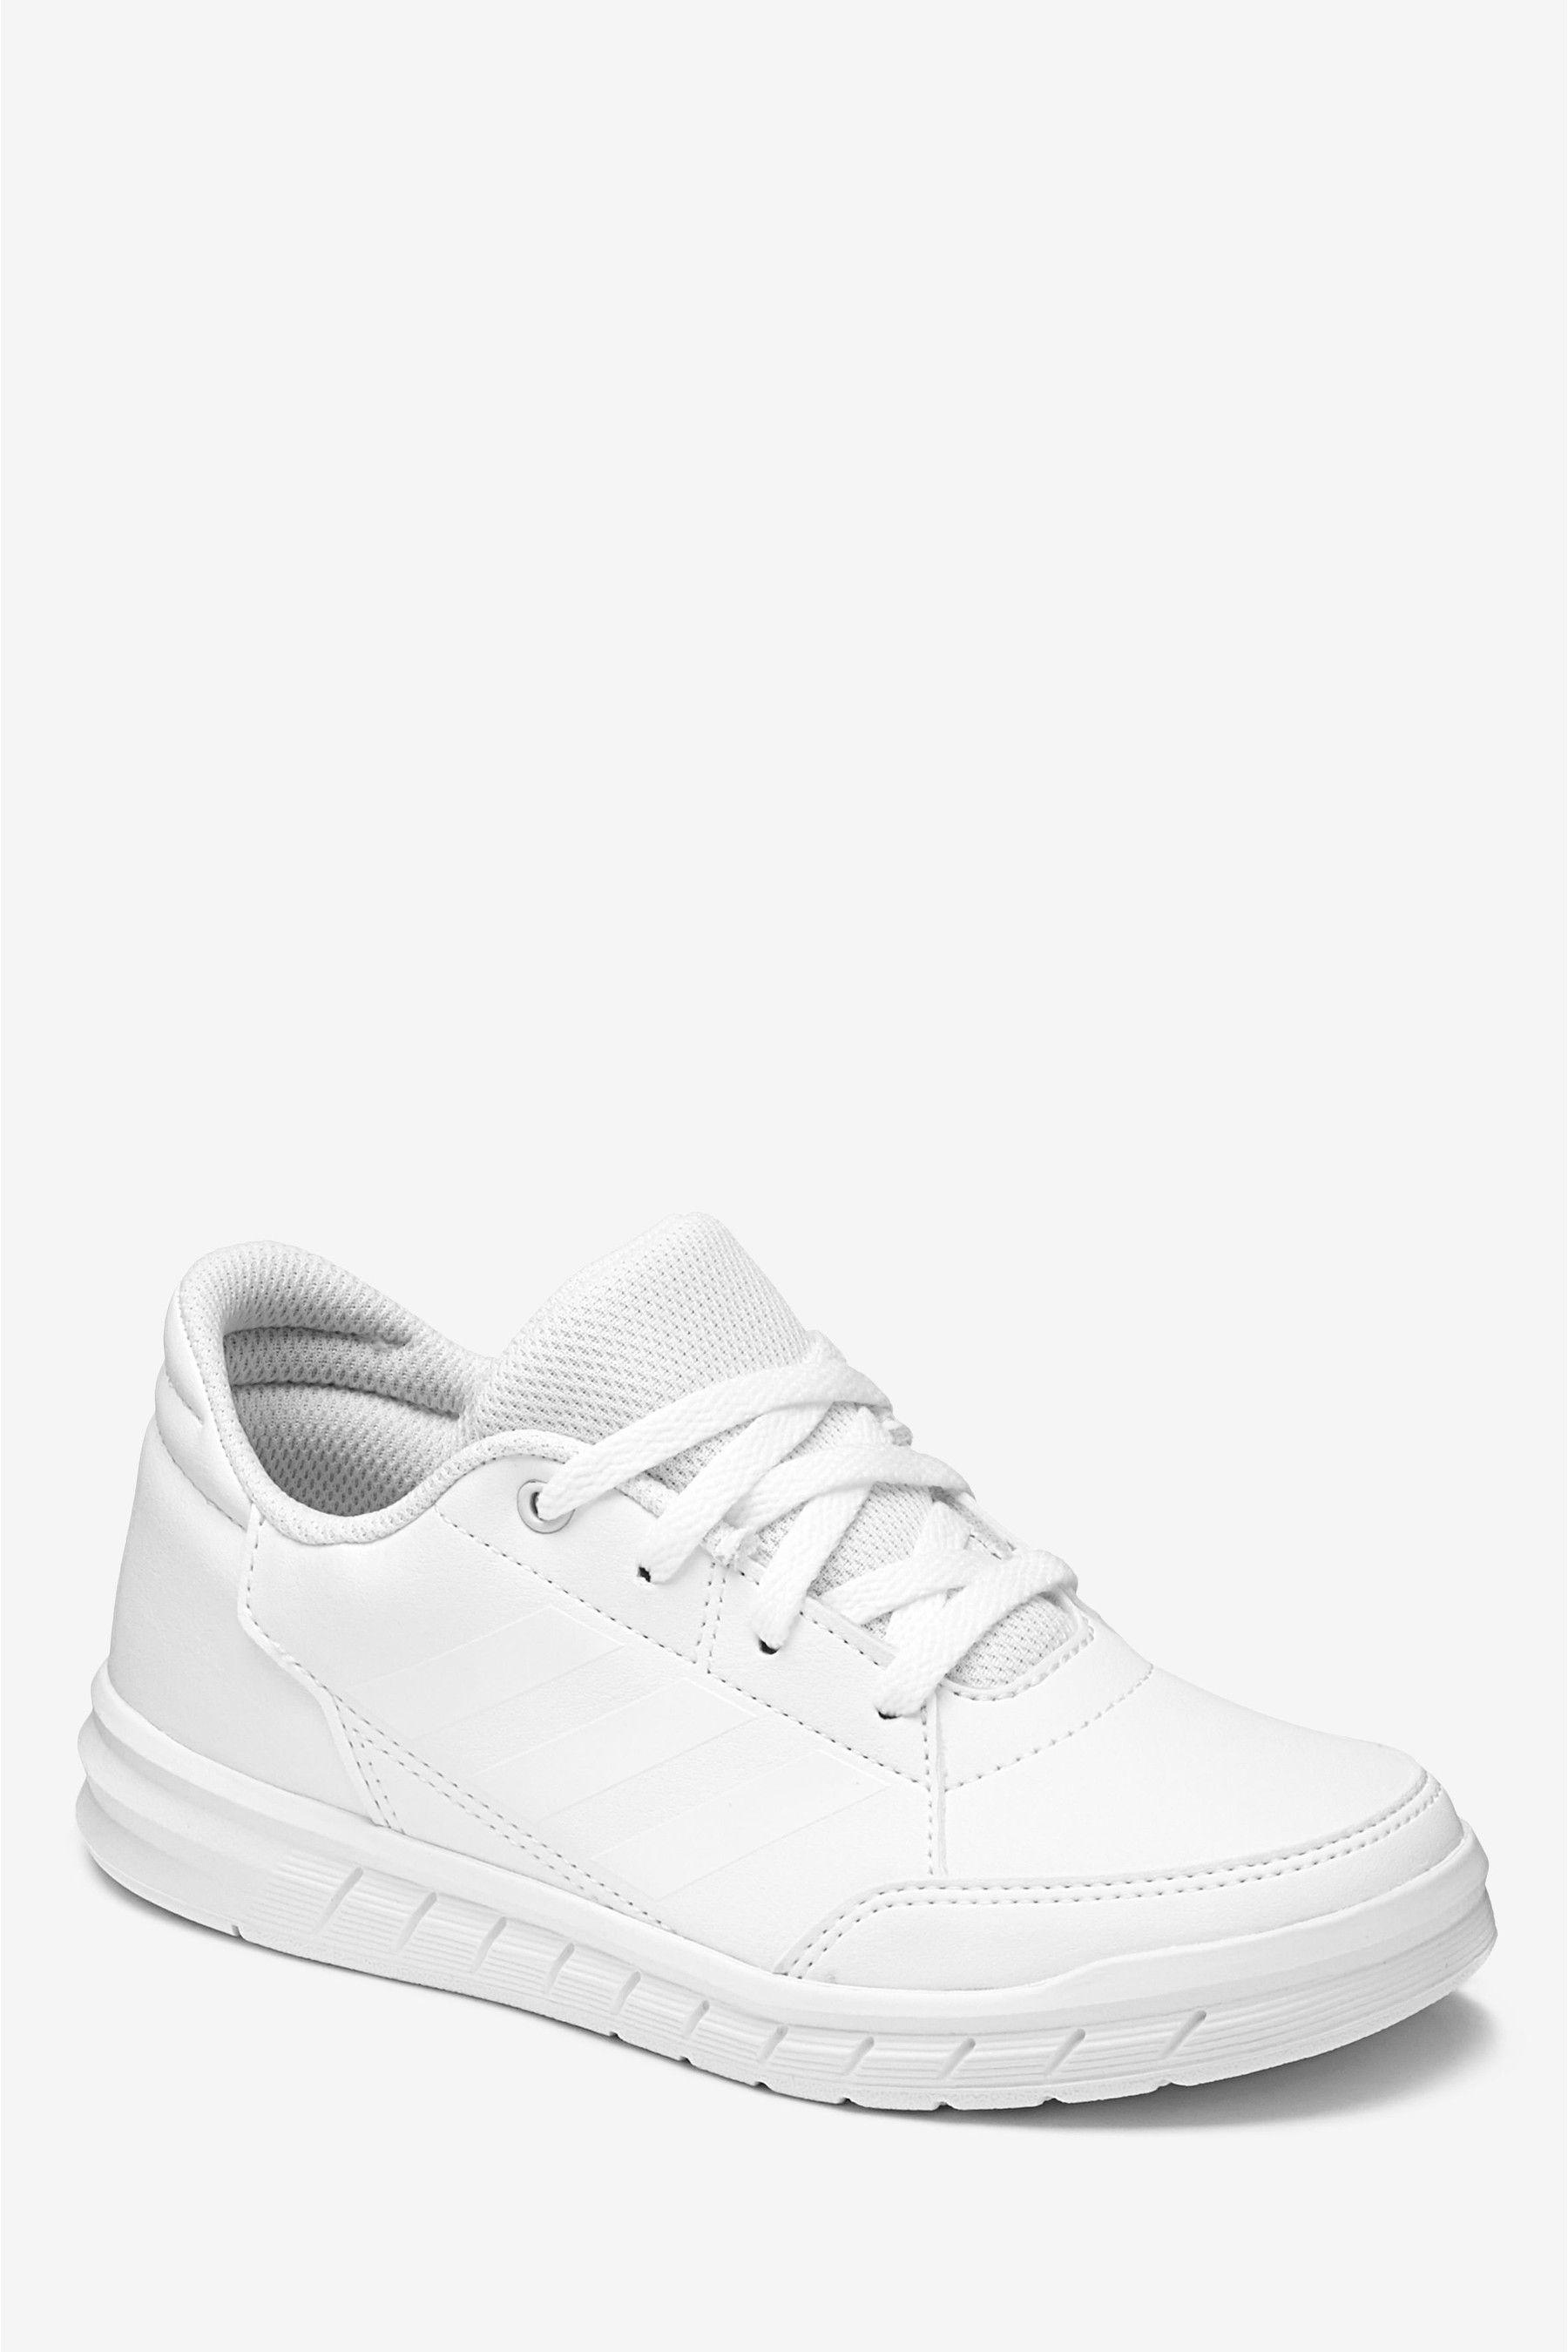 huge discount b7457 ed84a Boys adidas Altasport Junior   Youth - White